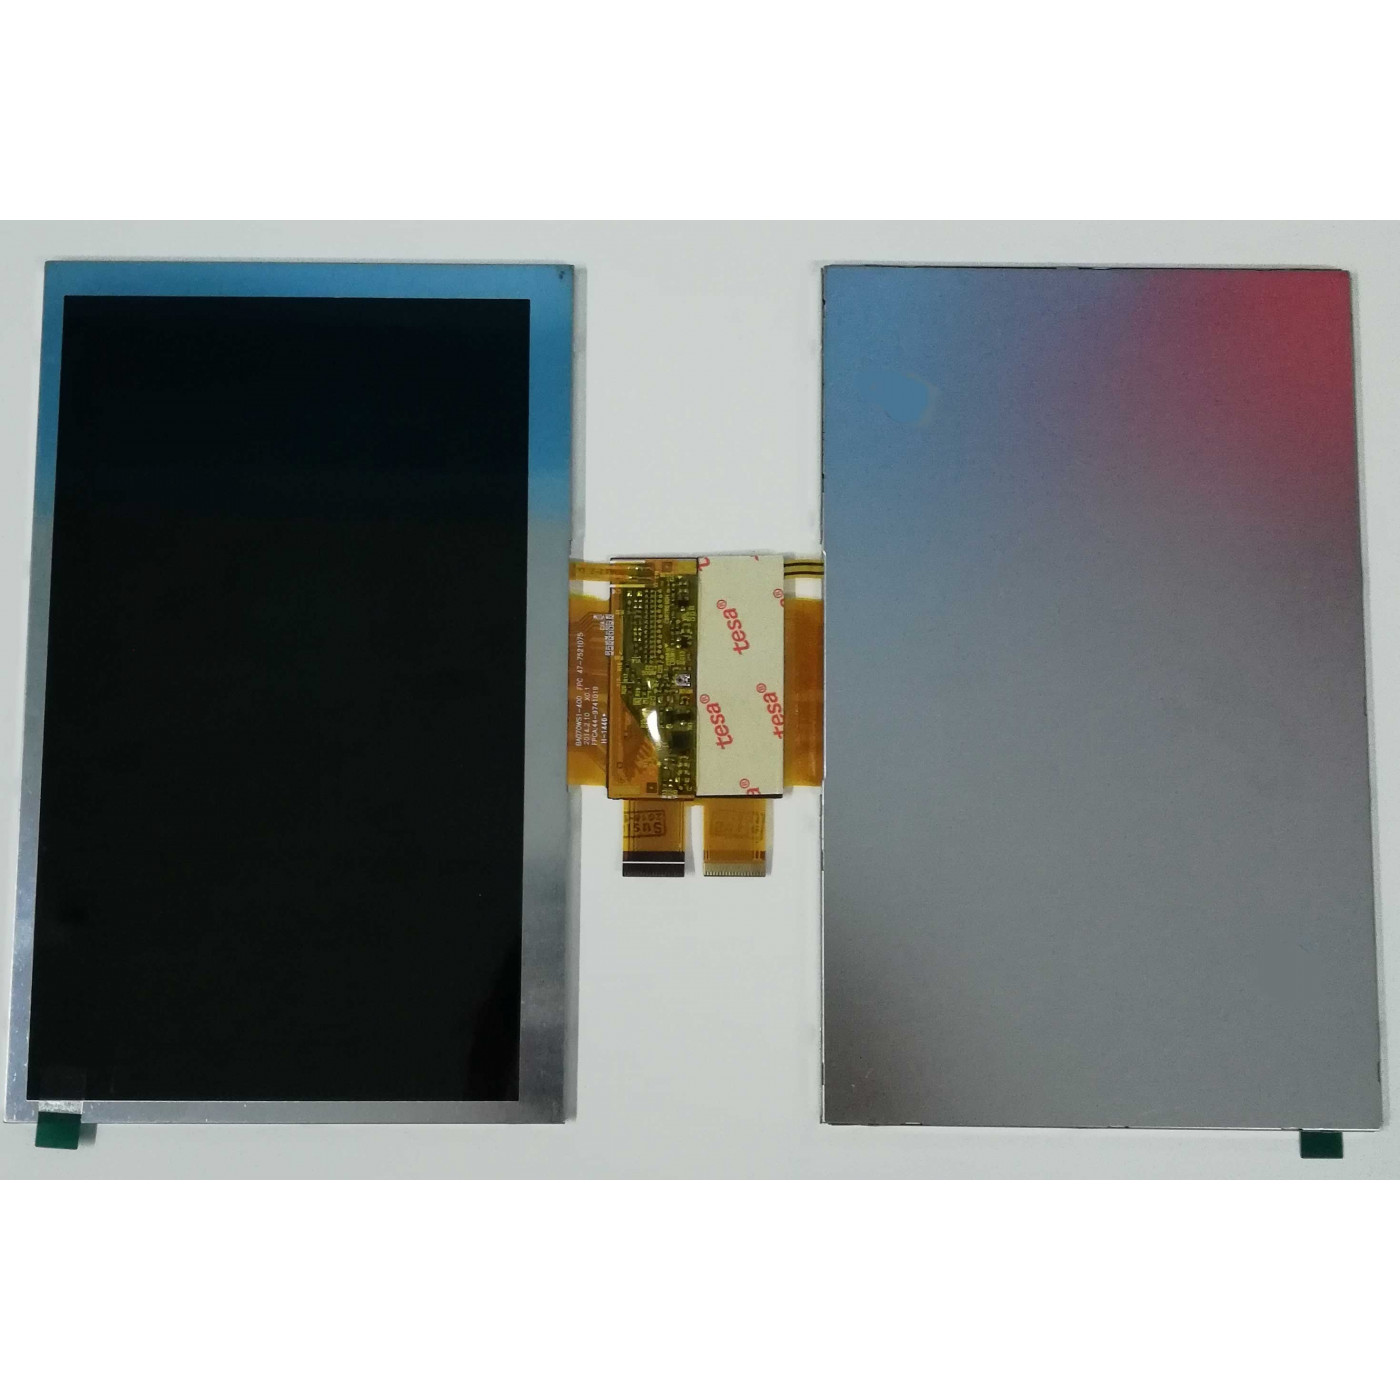 LCD DISPLAY Samsung Galaxy Tab 3 T110 T111 SM LITE SCREEN MONITOR